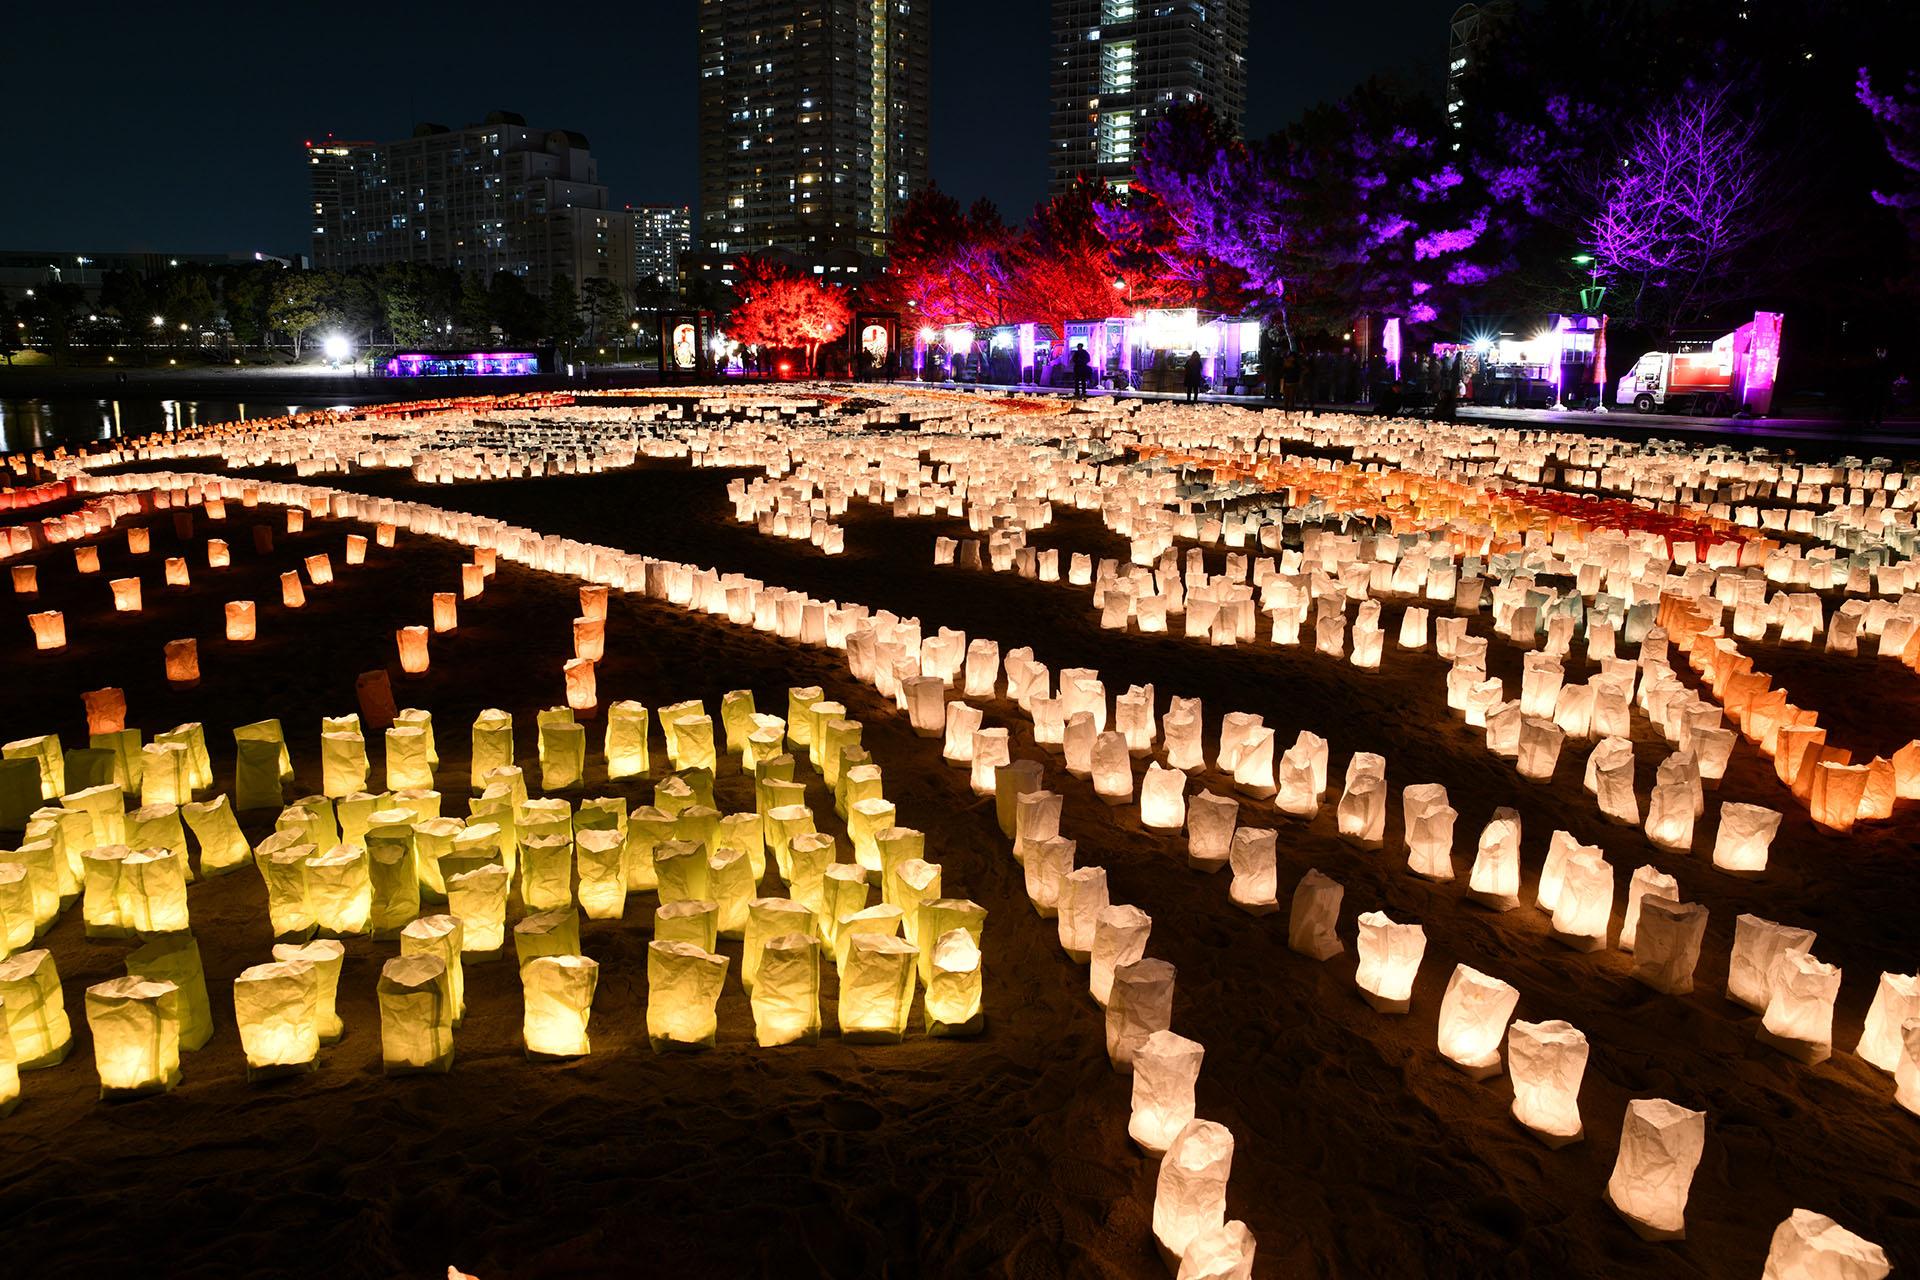 hokusai&TOKYO 水辺を彩る江戸祭 Nikon D850 タムロン 北斎浜辺巨大浮世絵